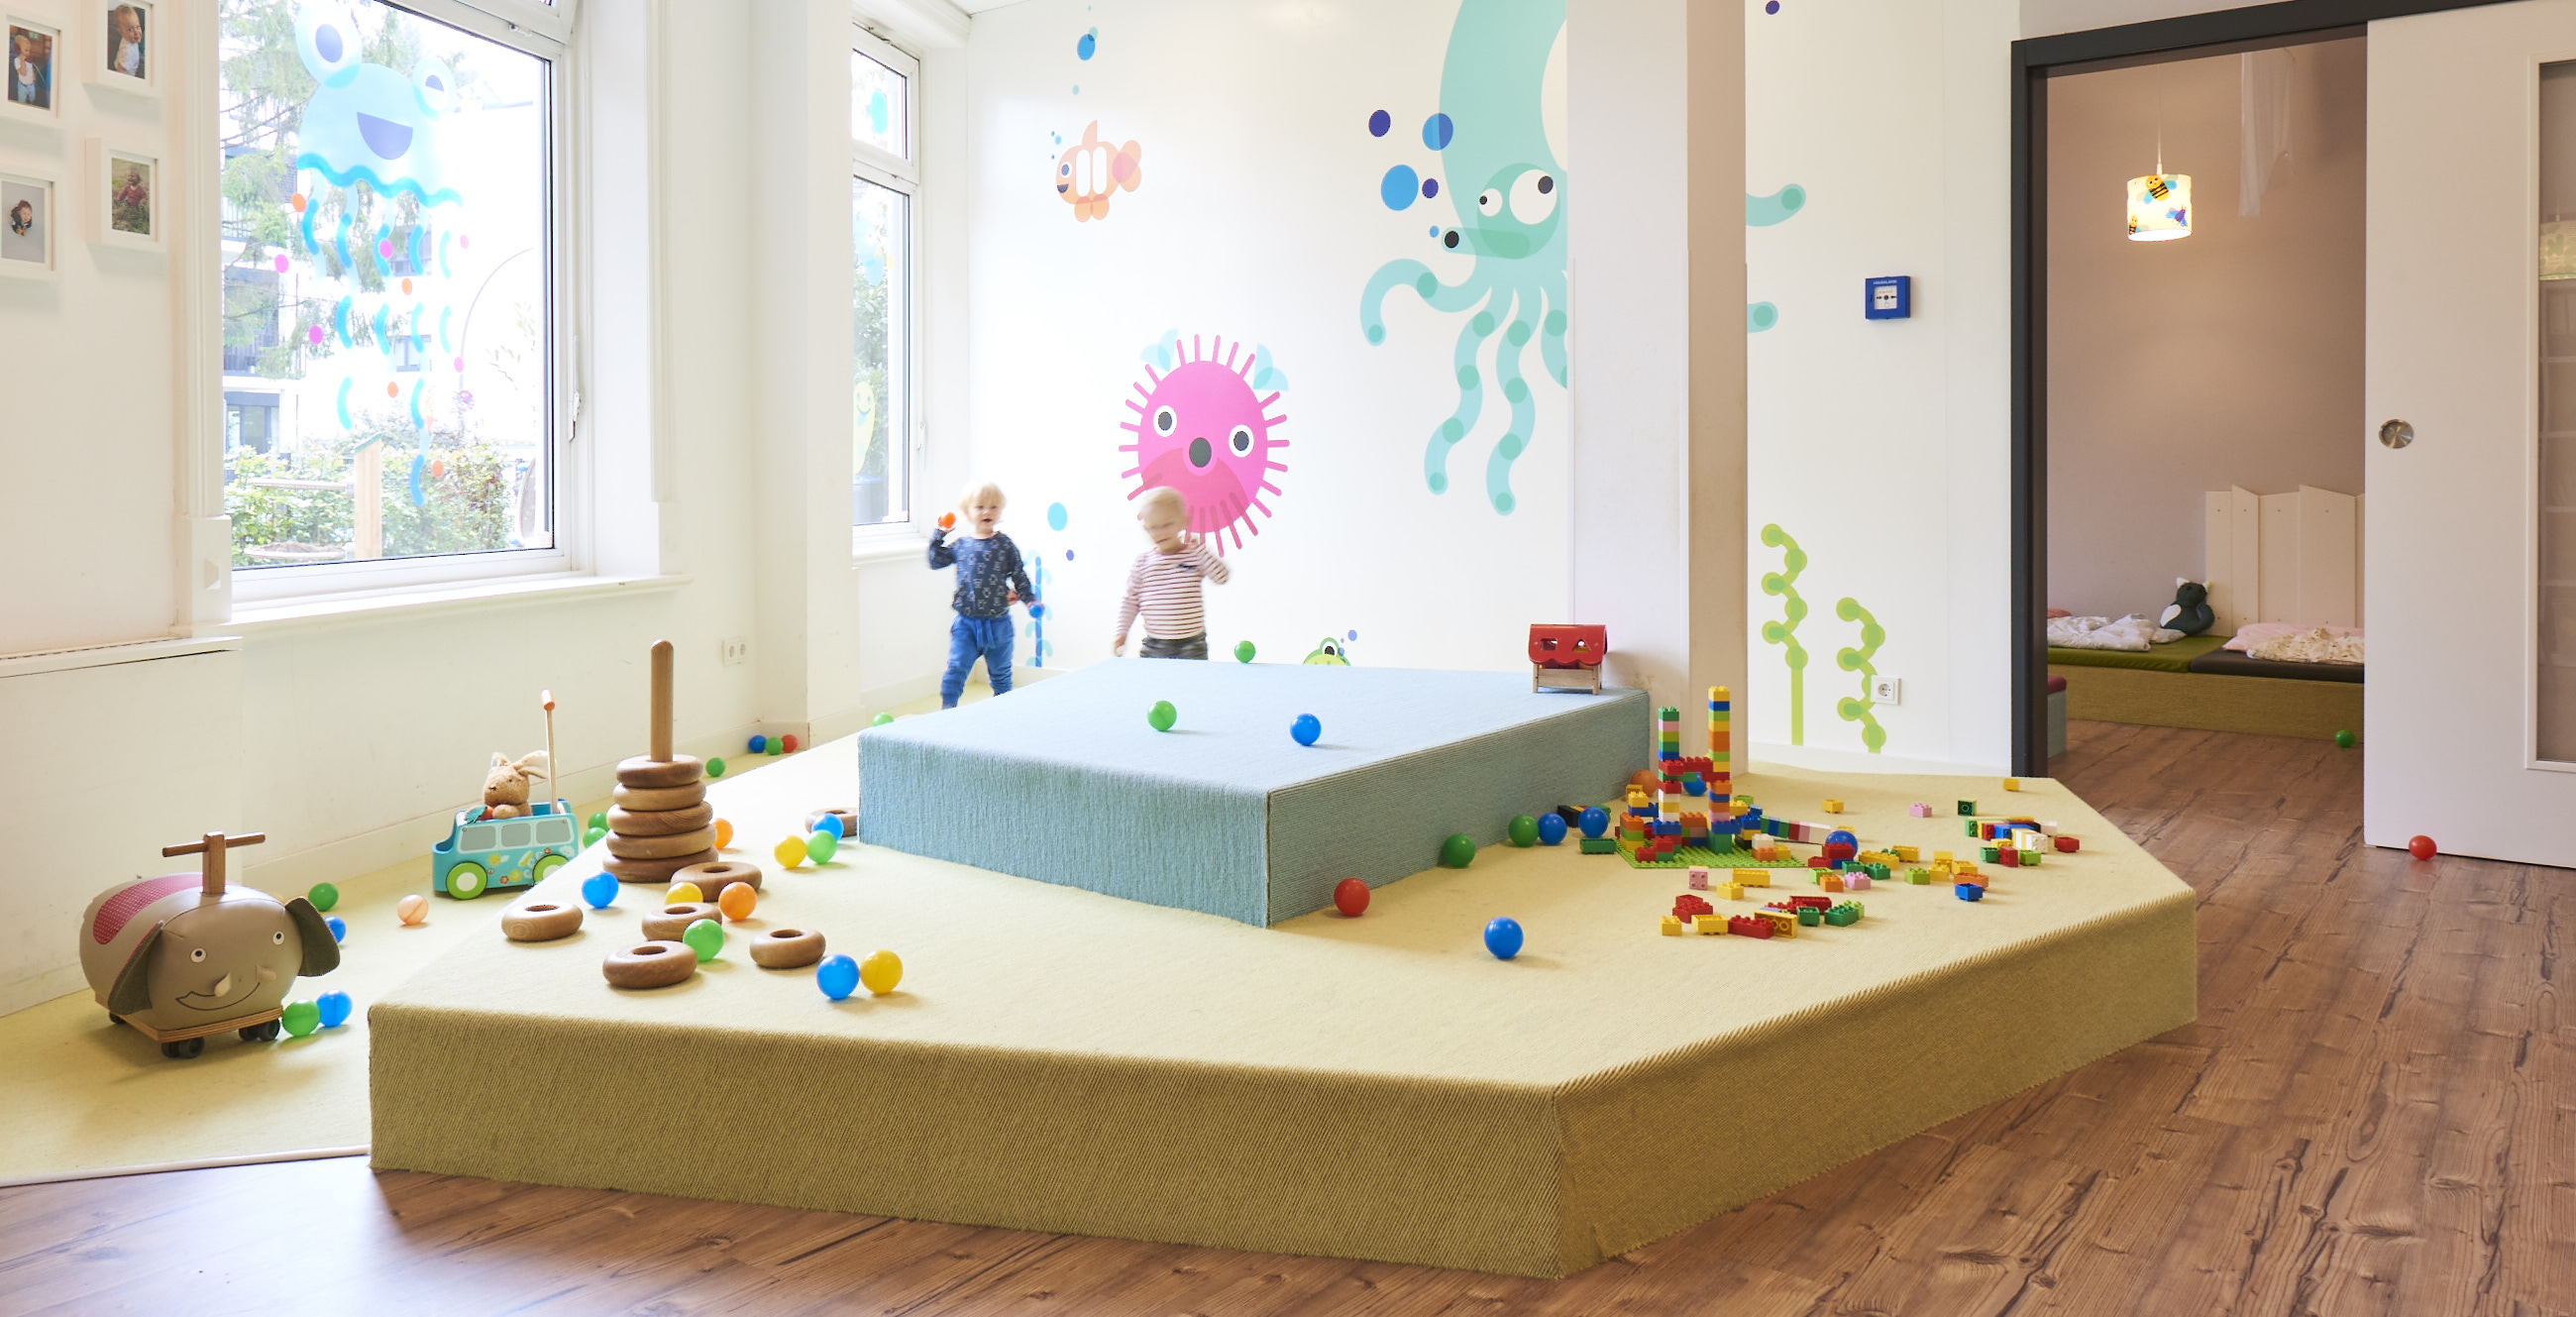 kita kinderzimmer villa flottbek gro flottbek private kinderg rten hamburg deutschland. Black Bedroom Furniture Sets. Home Design Ideas